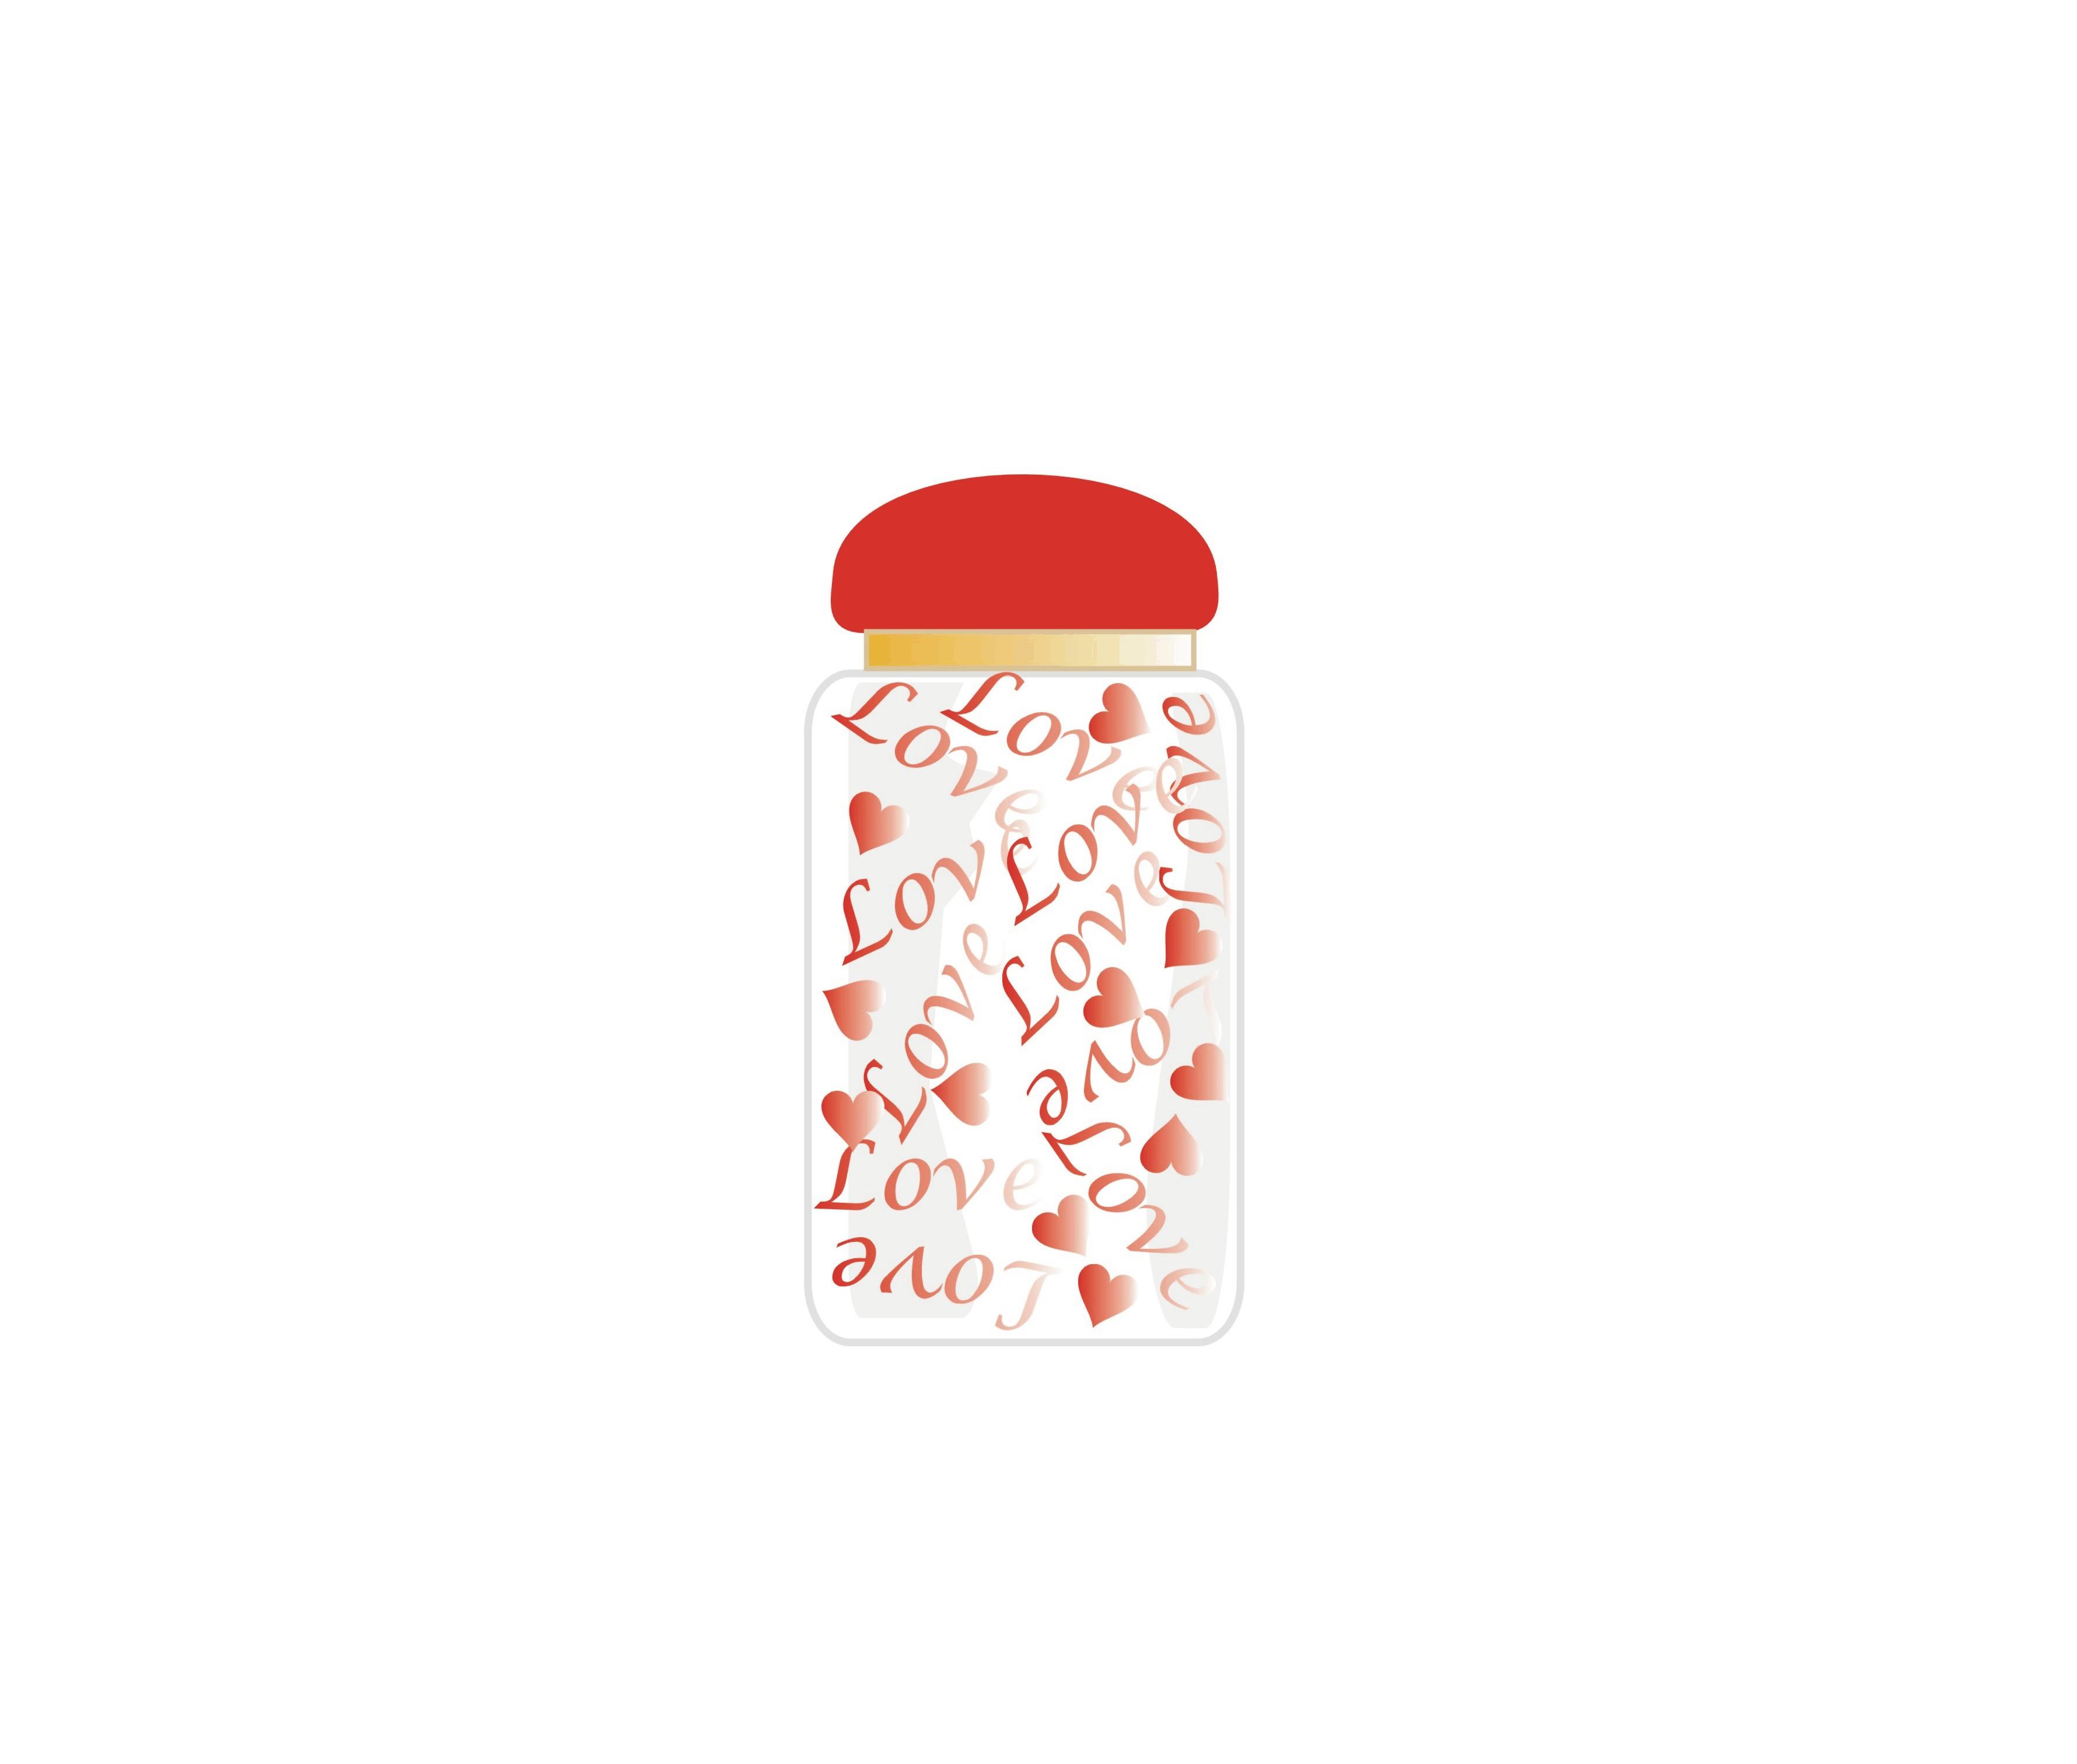 https://0201.nccdn.net/1_2/000/000/14f/151/jar_of_love_01.jpg